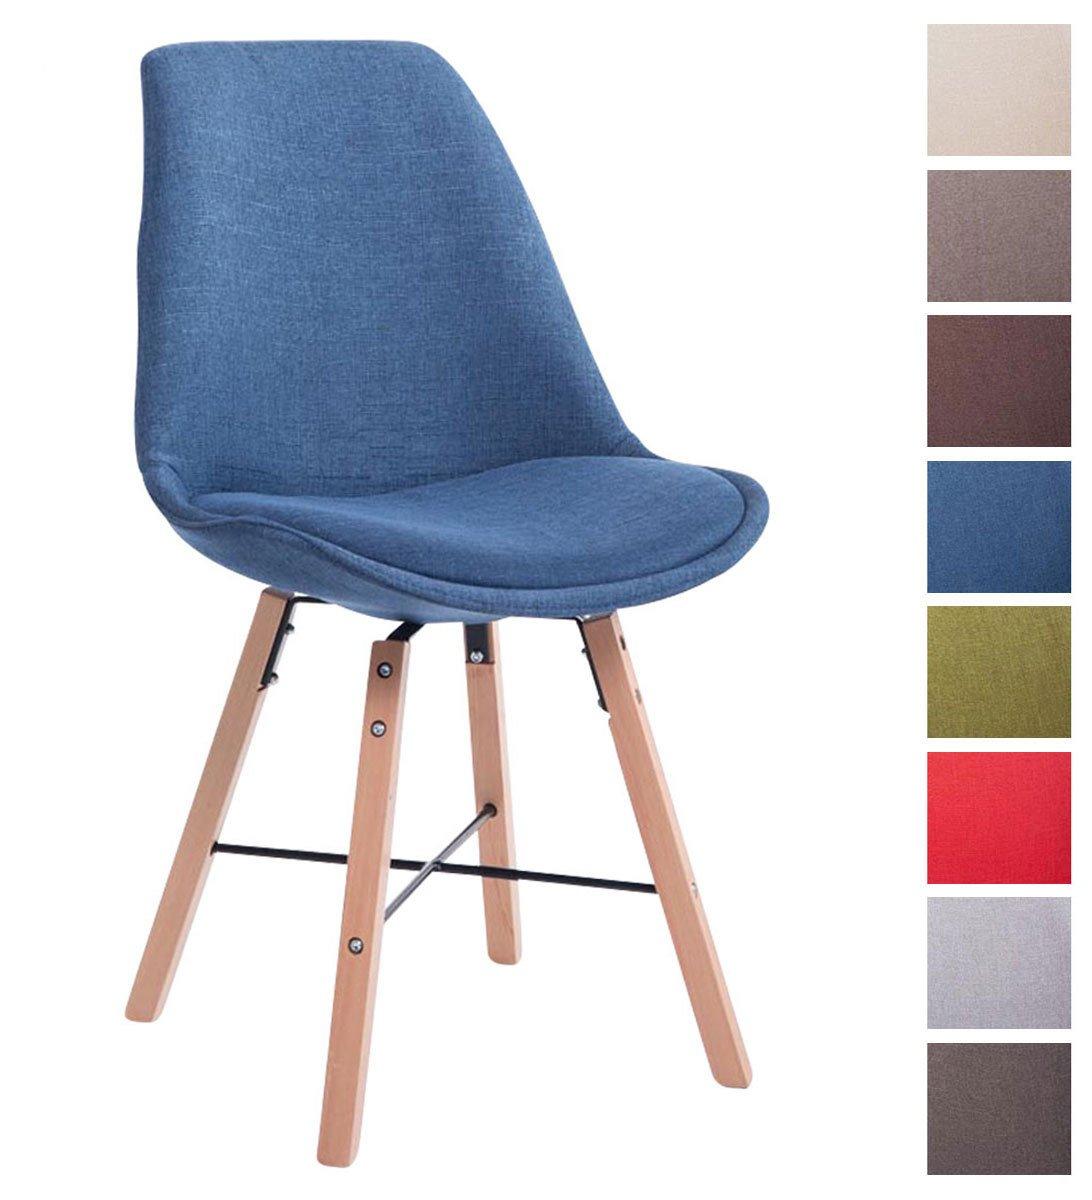 Sedie shopping online per abbigliamento scarpe for Sedie blu cucina